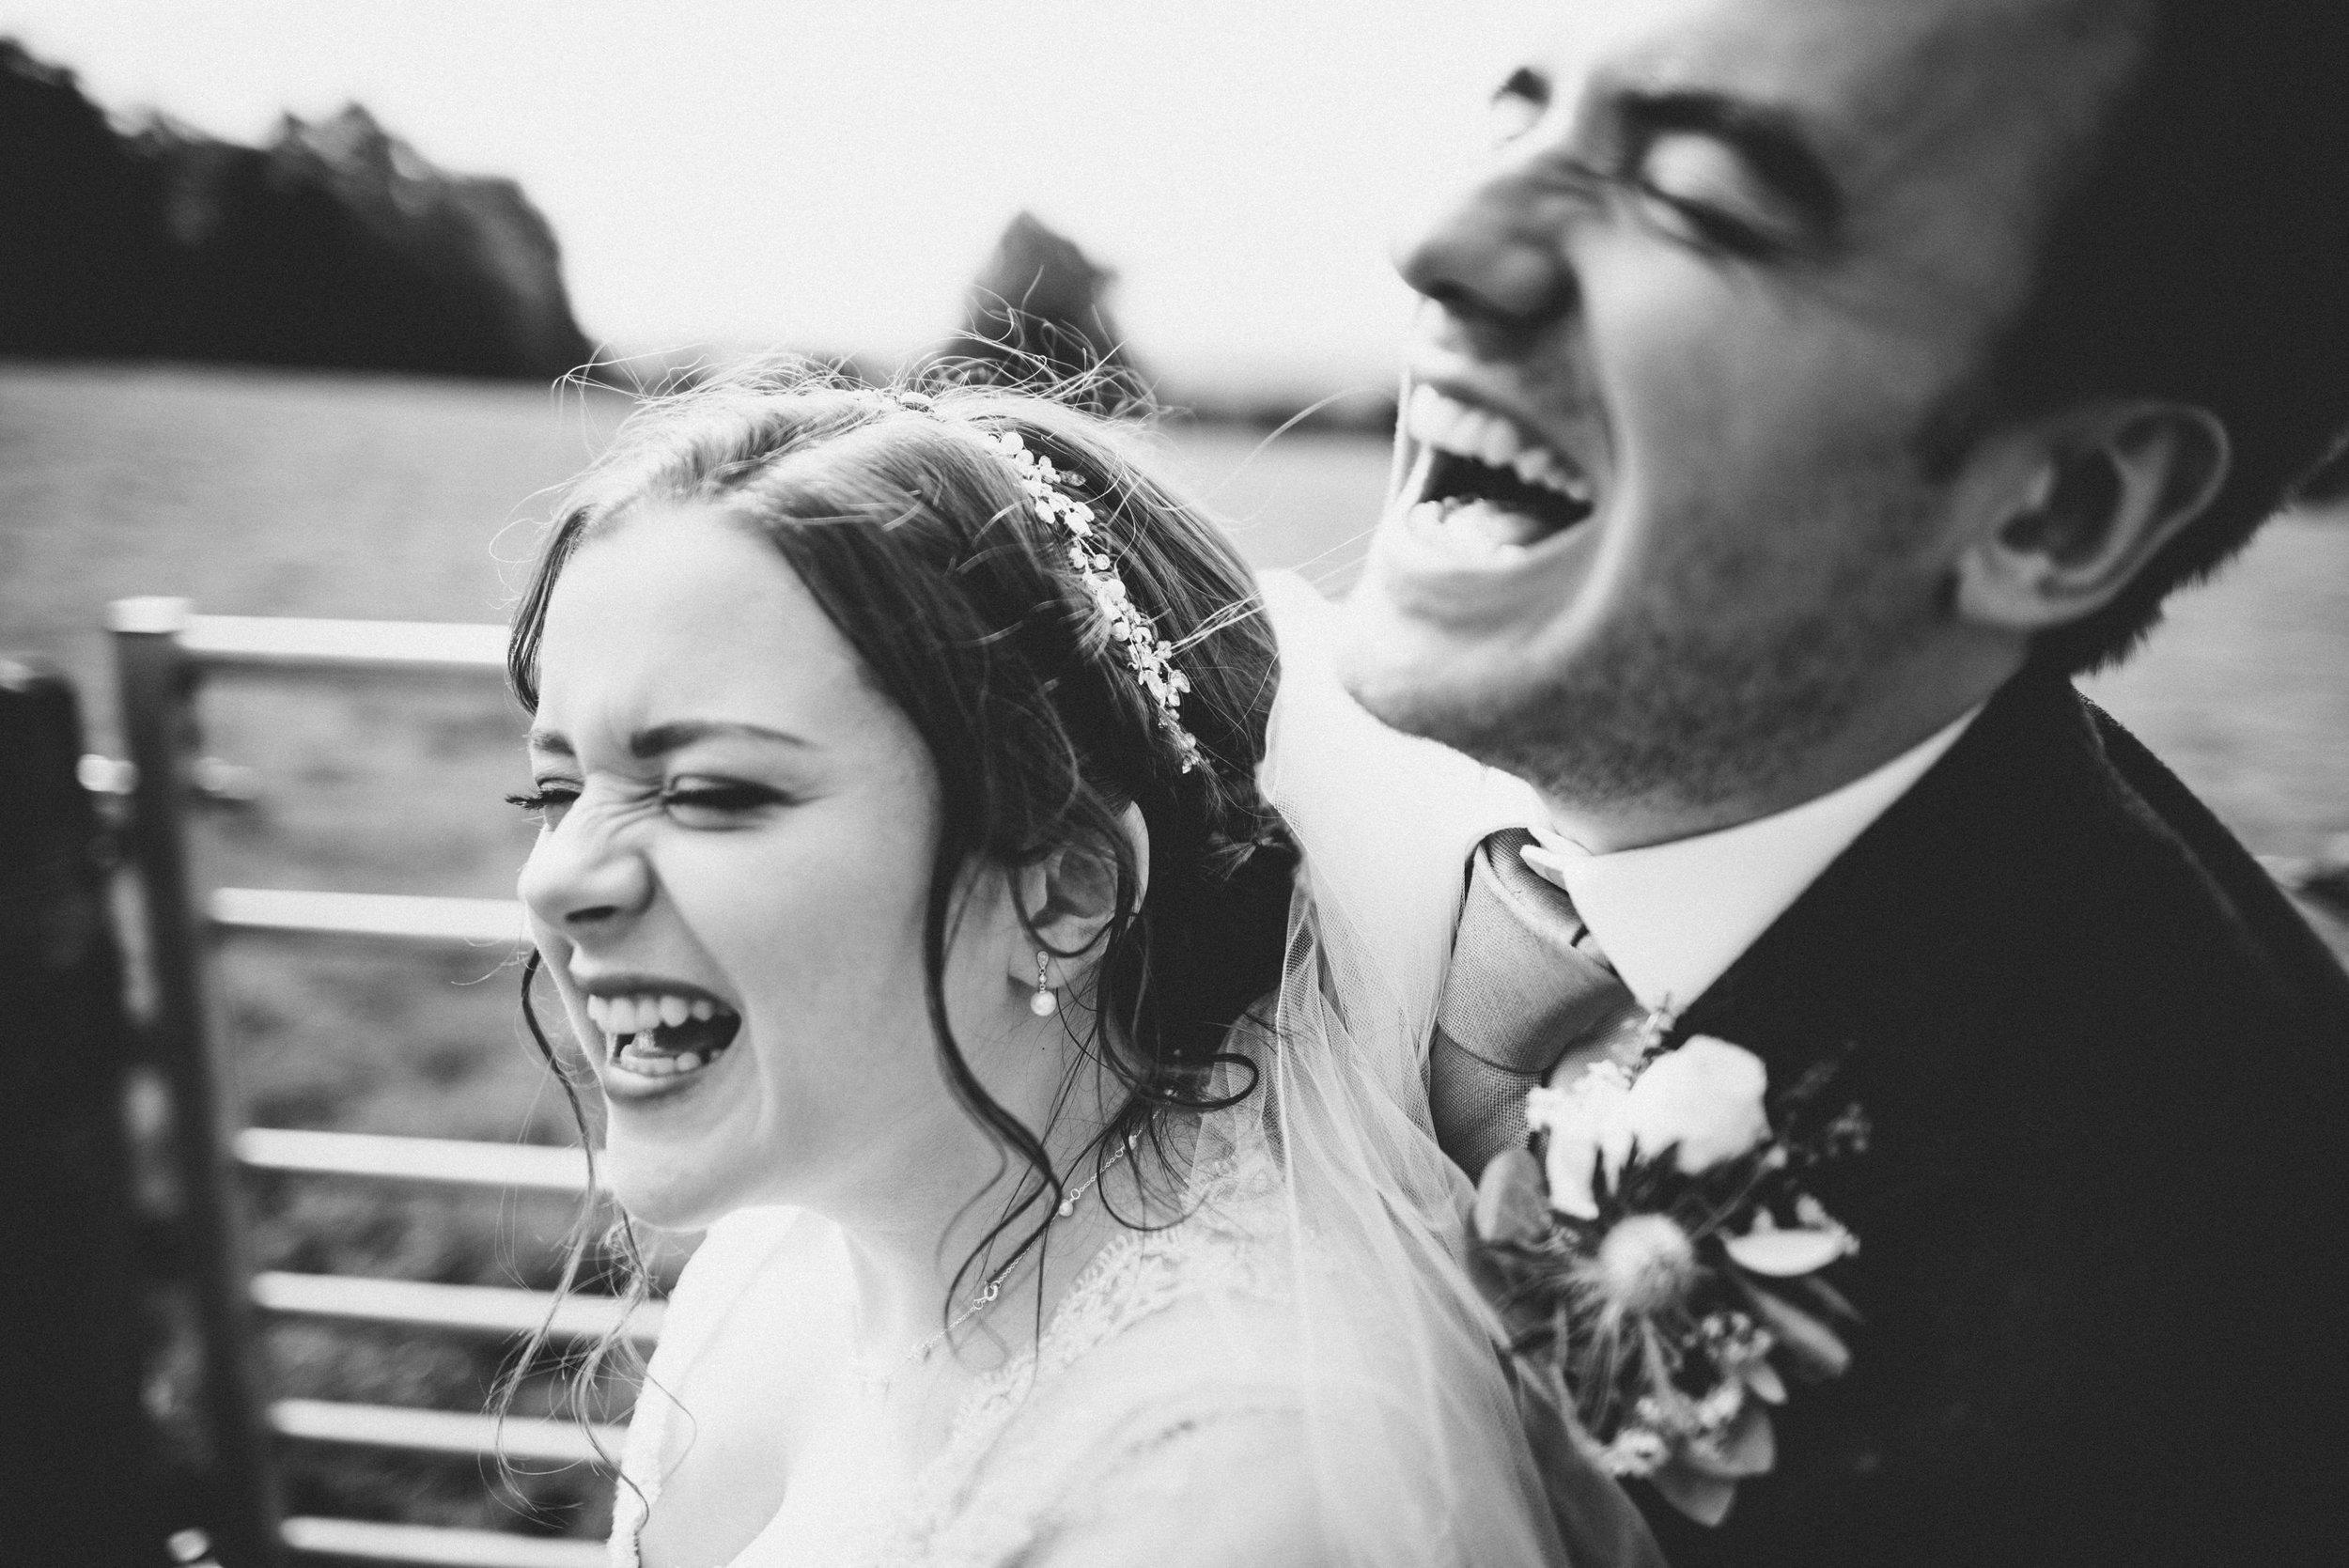 0078-LISA-DEVINE-PHOTOGRAPHY-ALTERNATIVE-WEDDING-PHOTOGRAPHY-SCOTLAND-DESTINATION-WEDDINGS-GLASGOW-WEDDINGS-COOL-WEDDINGS-STYLISH-WEDDINGS.JPG